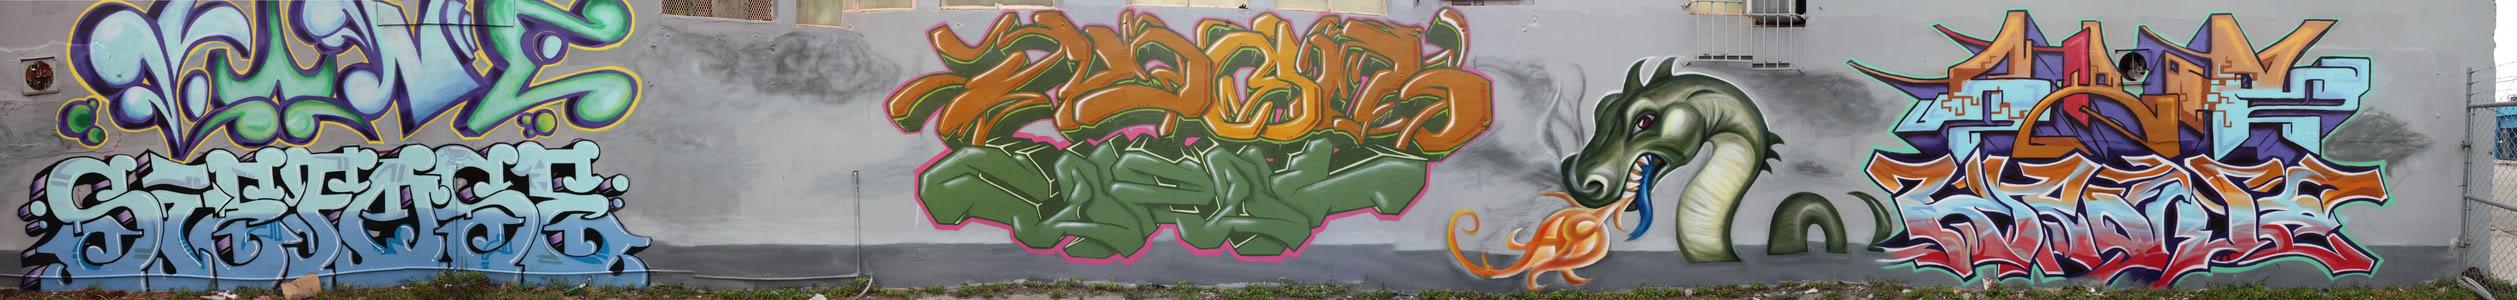 ai17.photobucket.com_albums_b93_fane397_Graffiti_ALL_AD_June_2008_Production.jpg